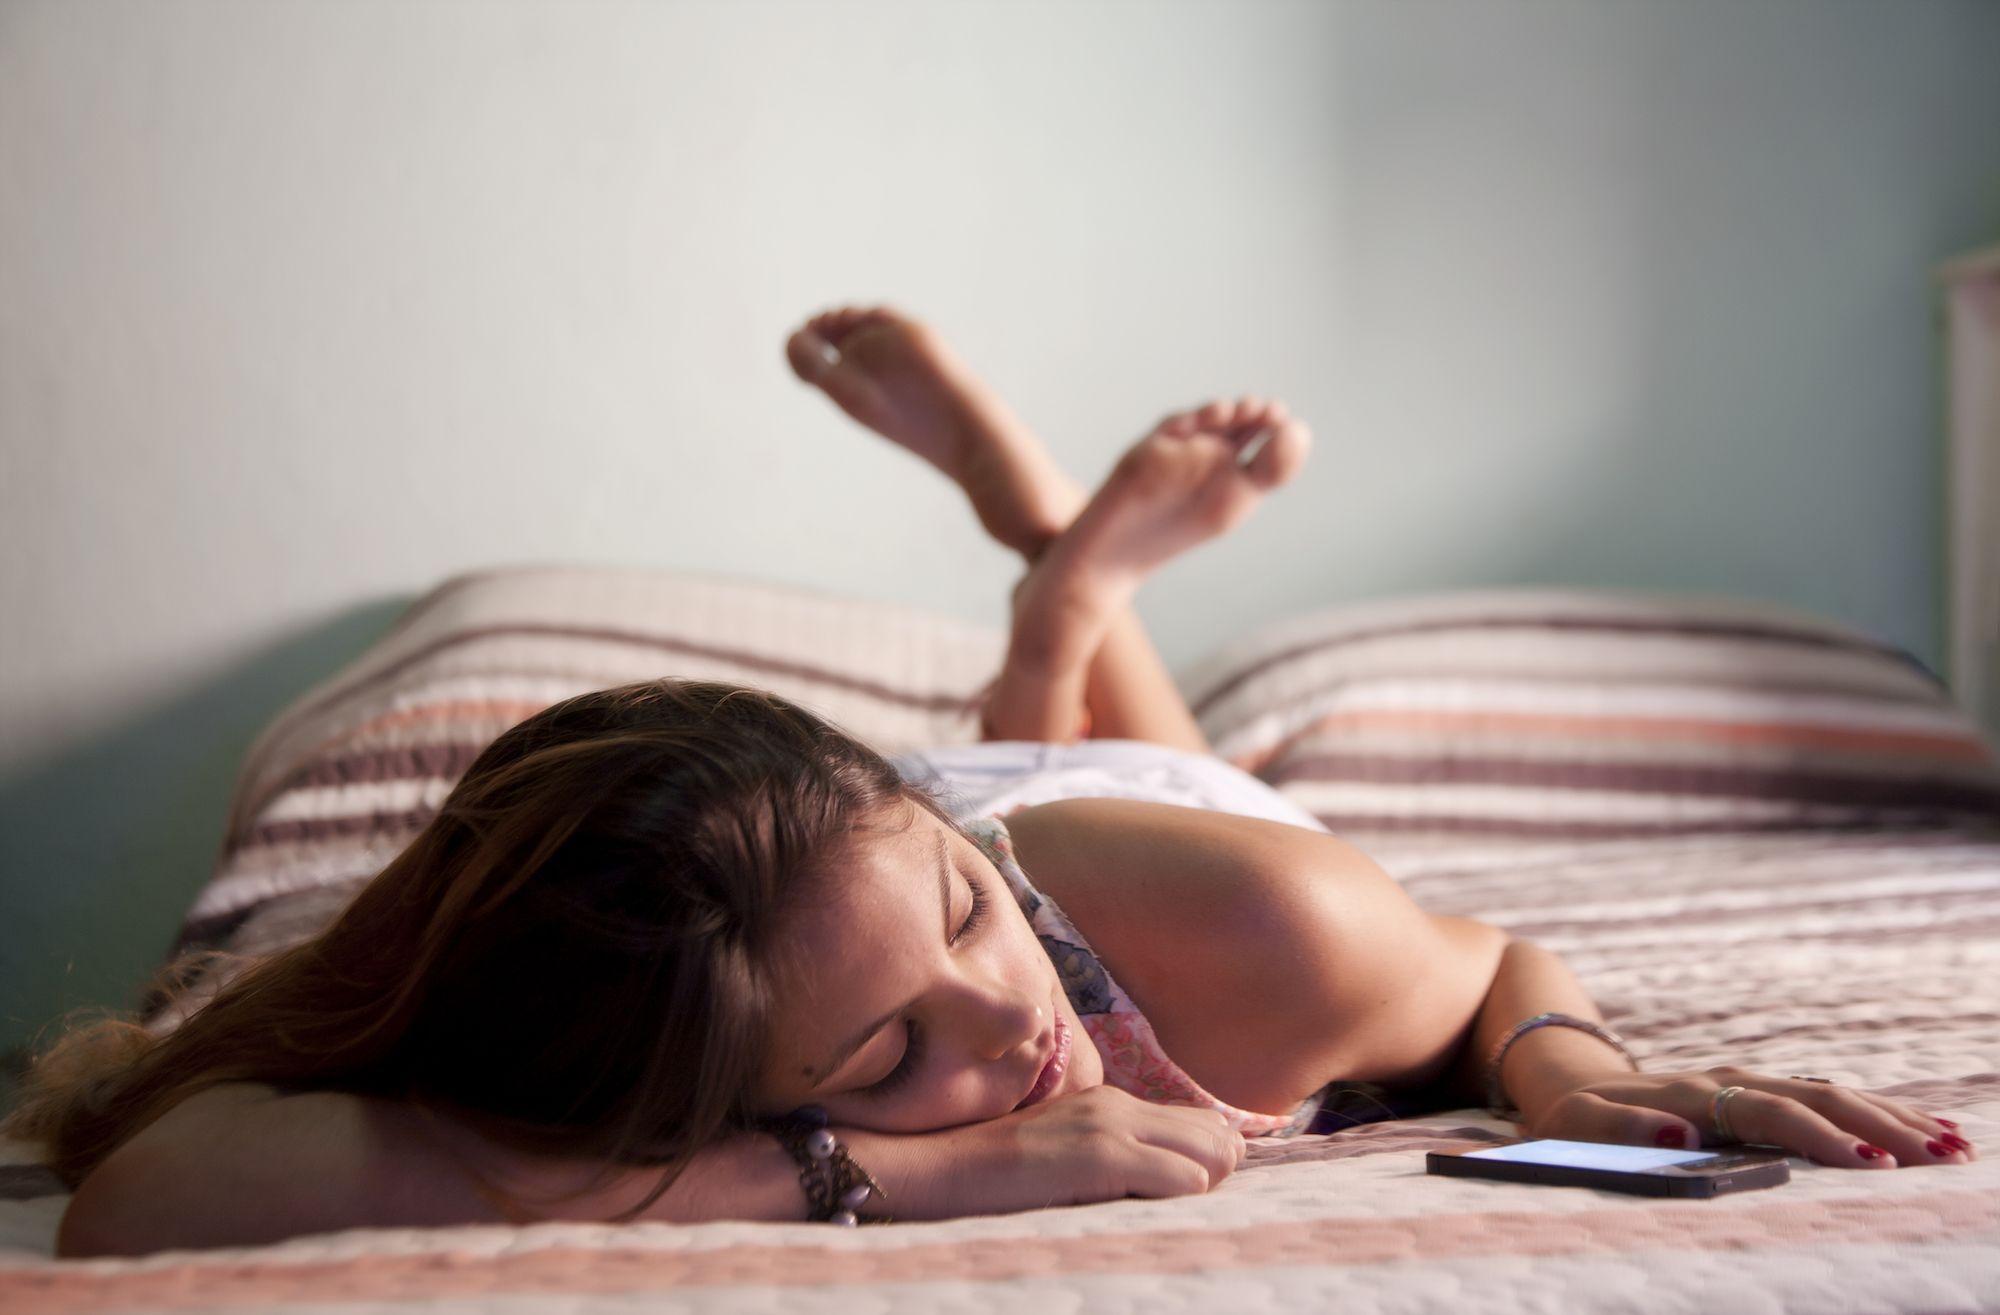 Venture Bros Gay Porn Best long distance relationship, sexting, skype, video sex